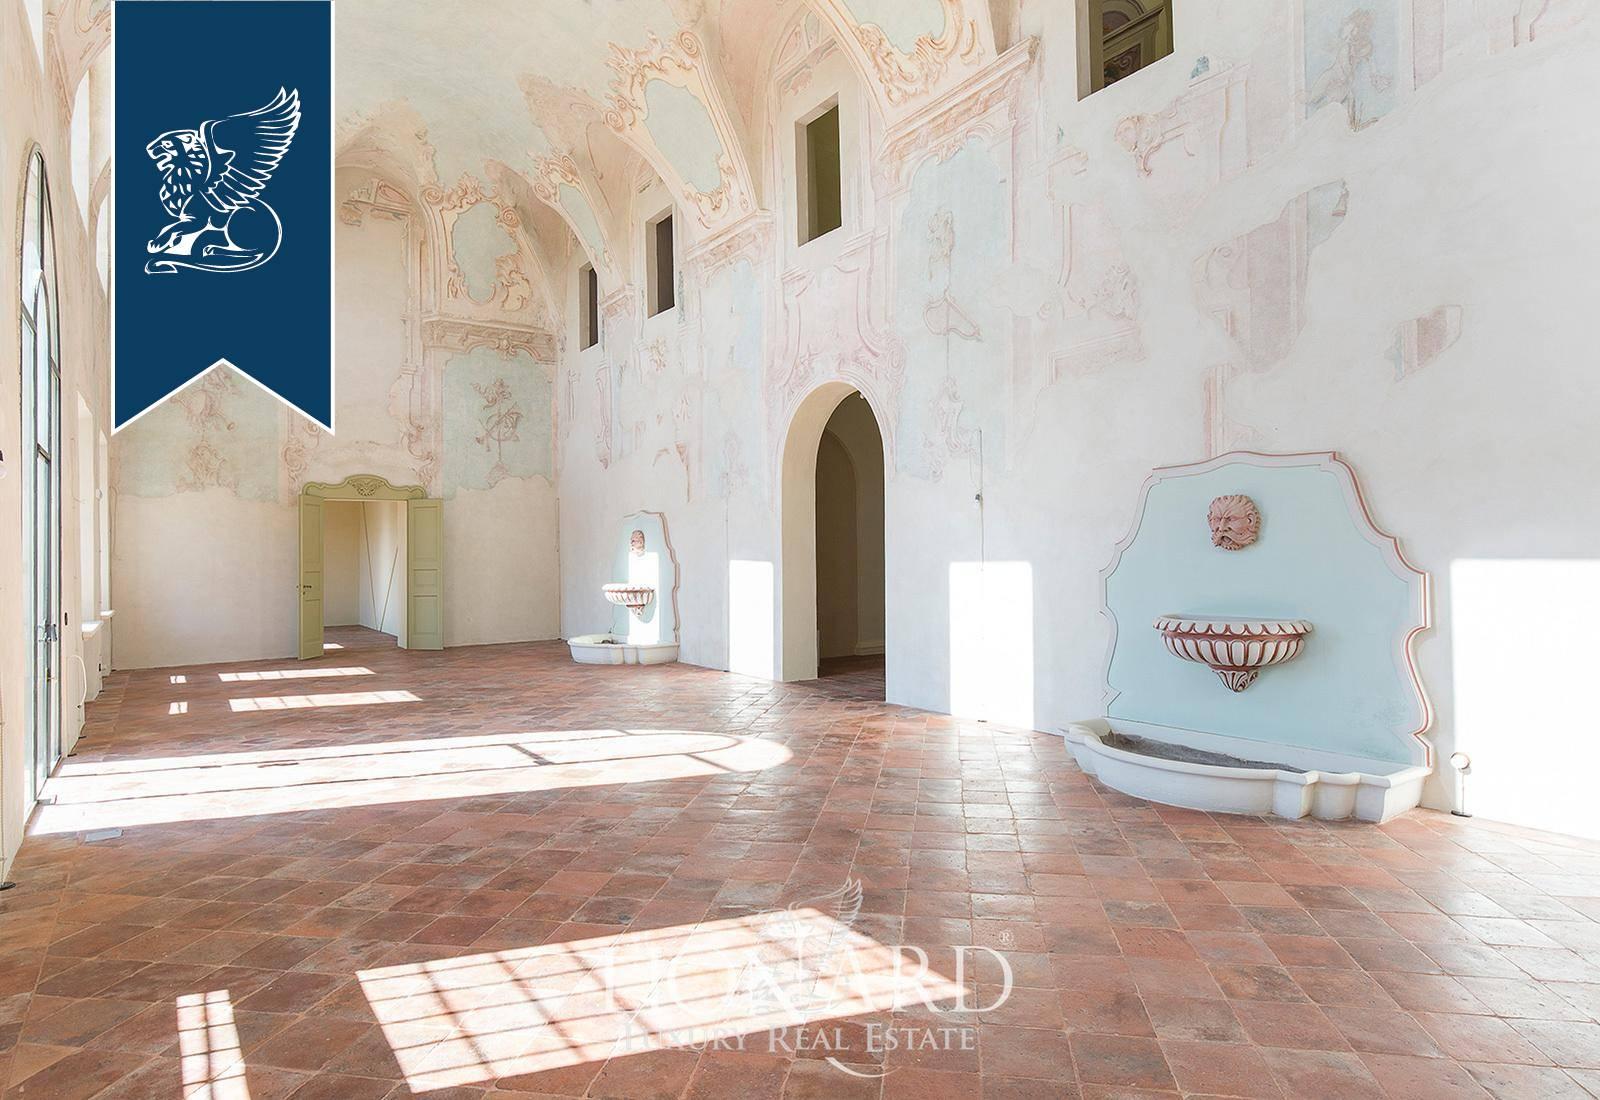 Villa in Vendita a Gonzaga: 0 locali, 2500 mq - Foto 7